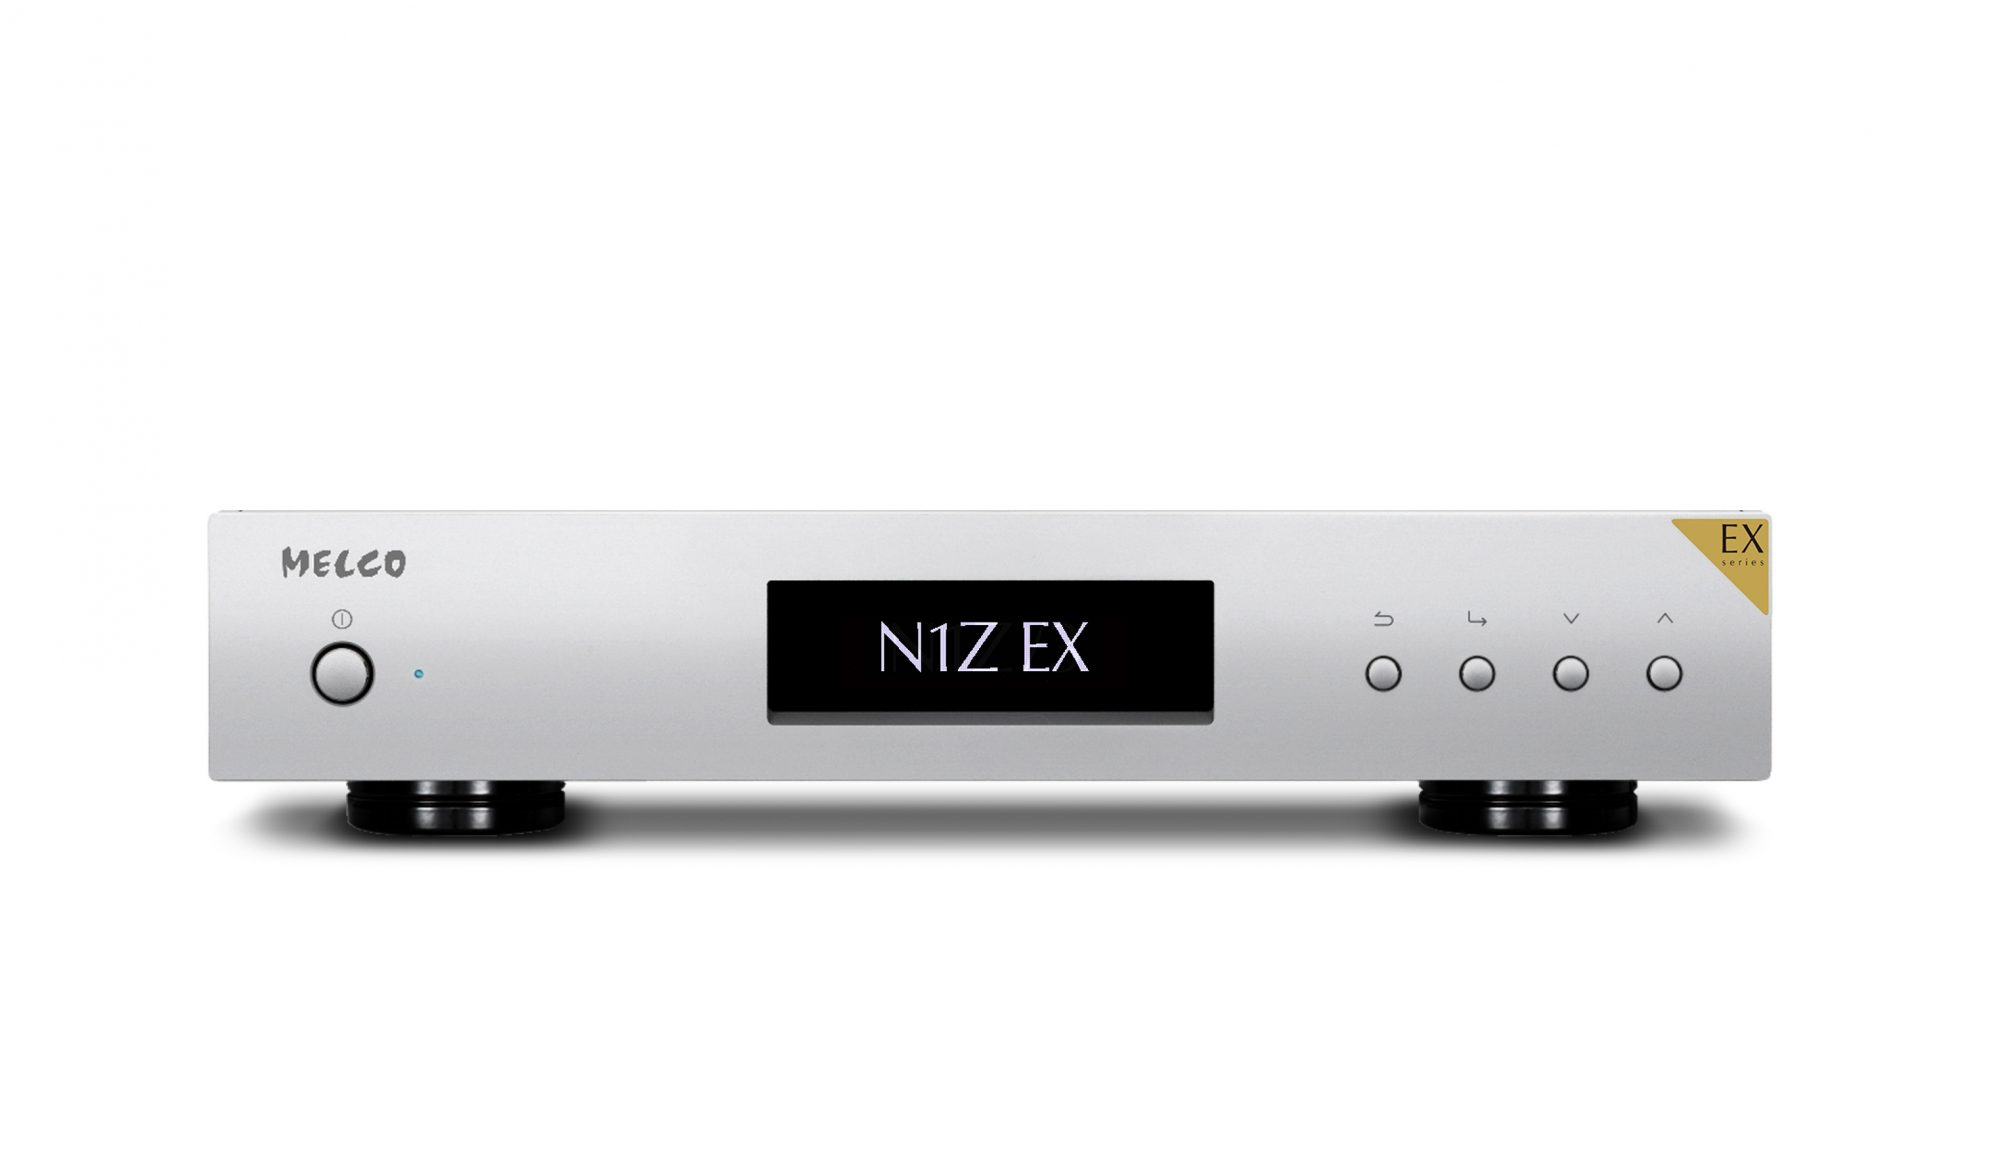 Melco N1Z/2EX-H60